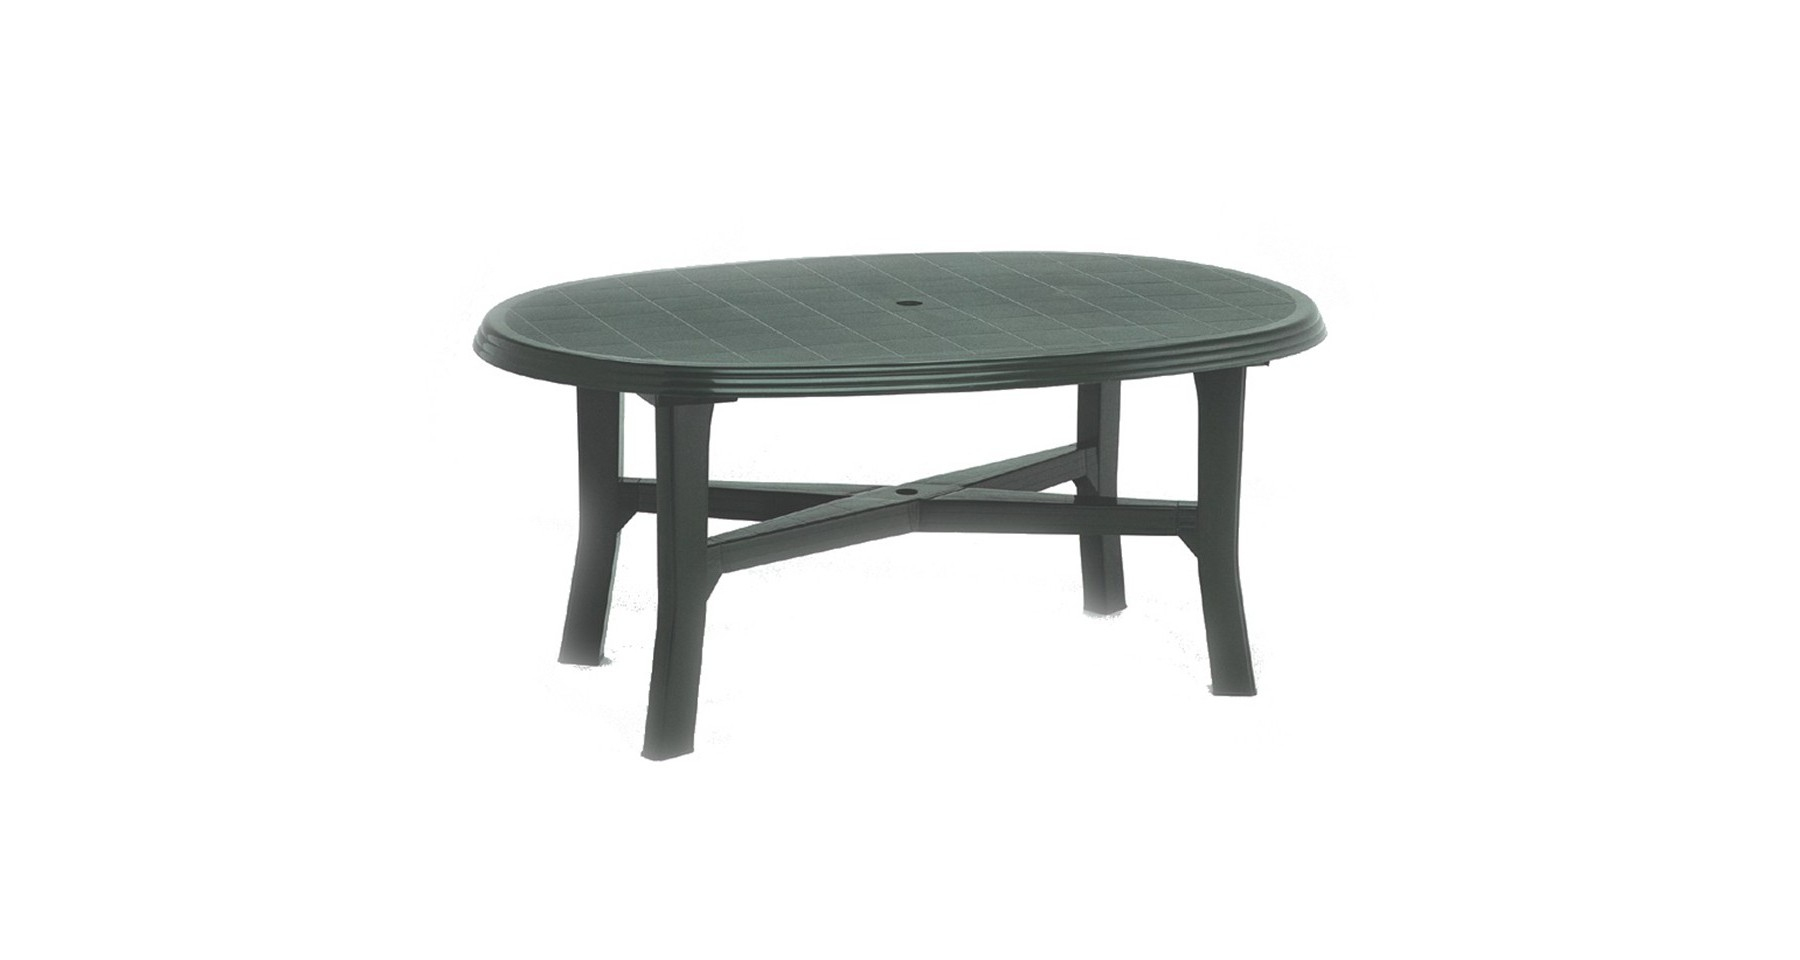 Table De Jardin Verte Ovale En Polyproplyène 6 Personnes Load pour Table De Jardin Verte